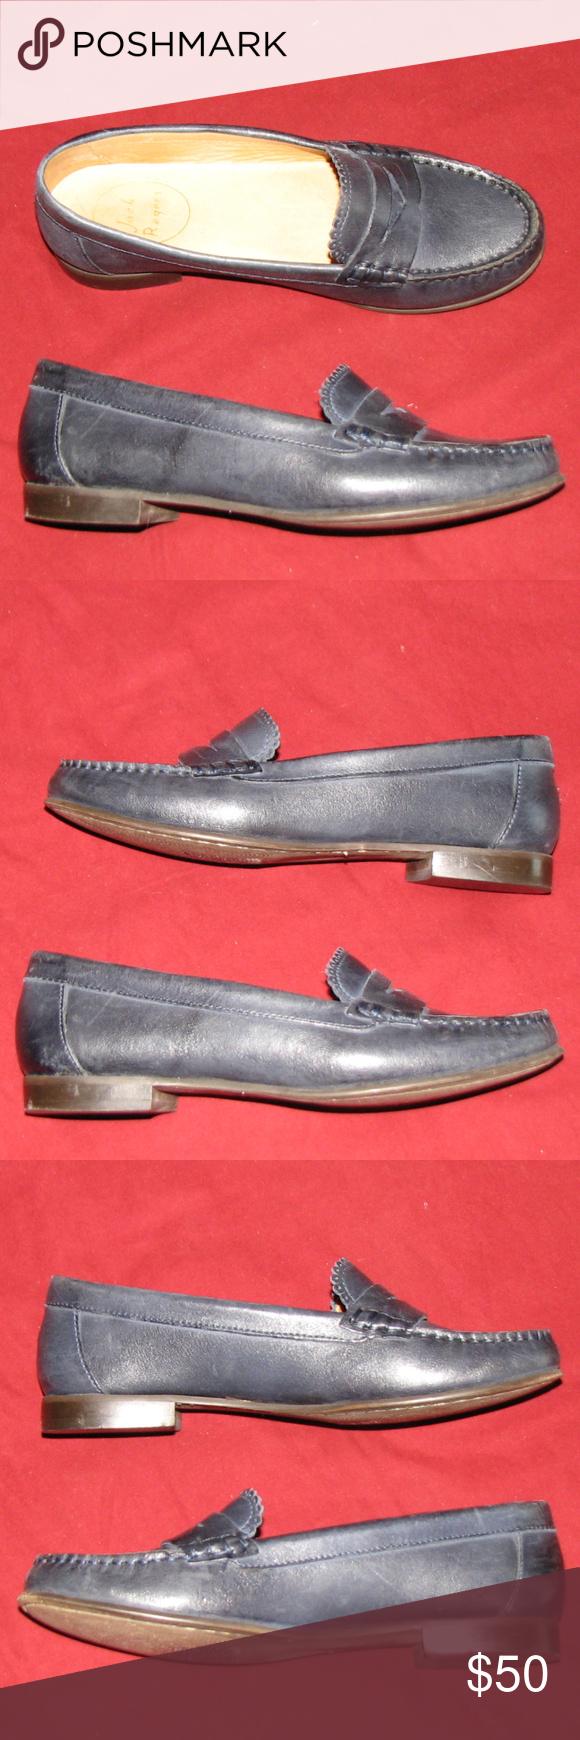 b92841b3dd0 JACK ROGERS Quinn penny loafer midnight blue 6M Jack Rogers penny loafers  with box. Style